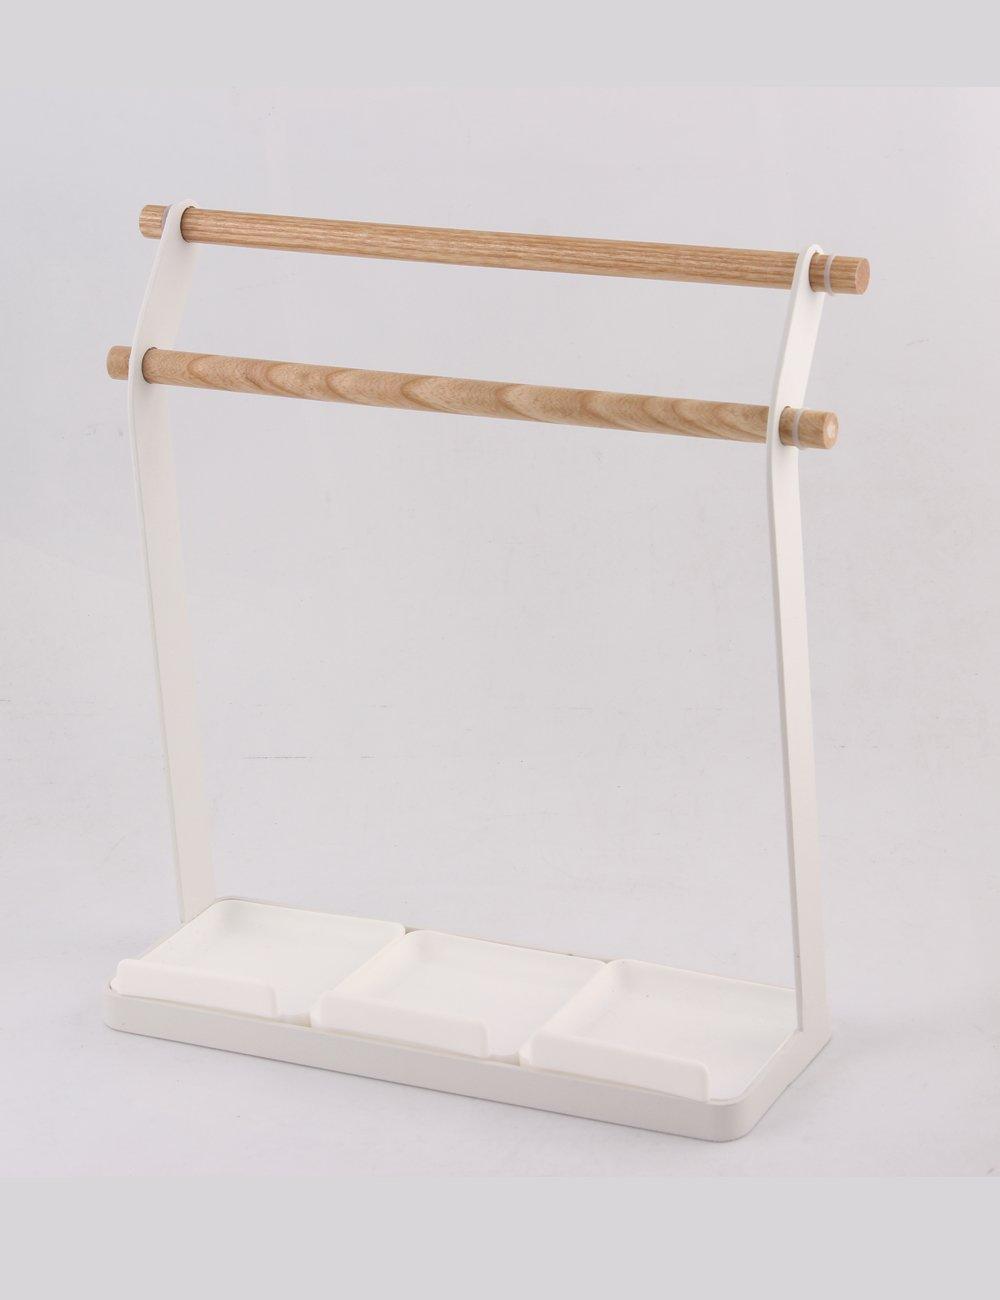 Galexbit Bathroom Towel Rack Kitchen Organizer Cabinet Cupboard Towel Rack Hanging Holder Organizer Hanger (black)